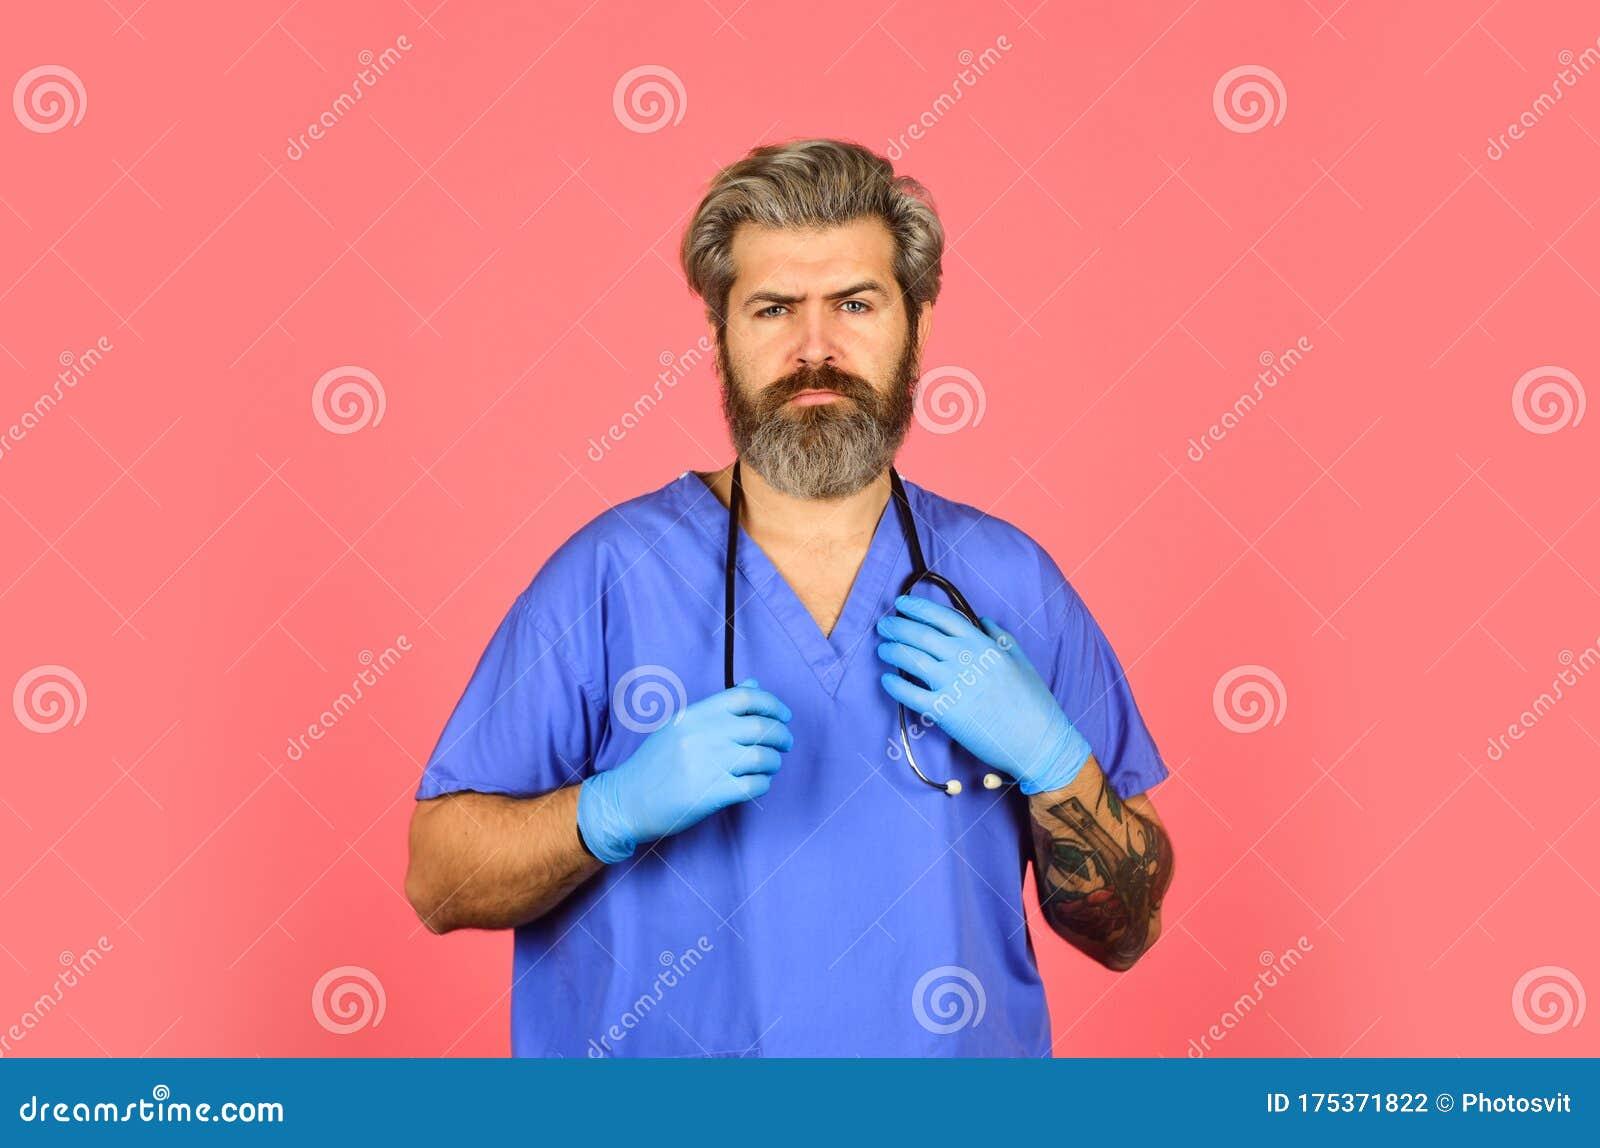 Free Medicine Concept. Professional Doctor. Insurance ...